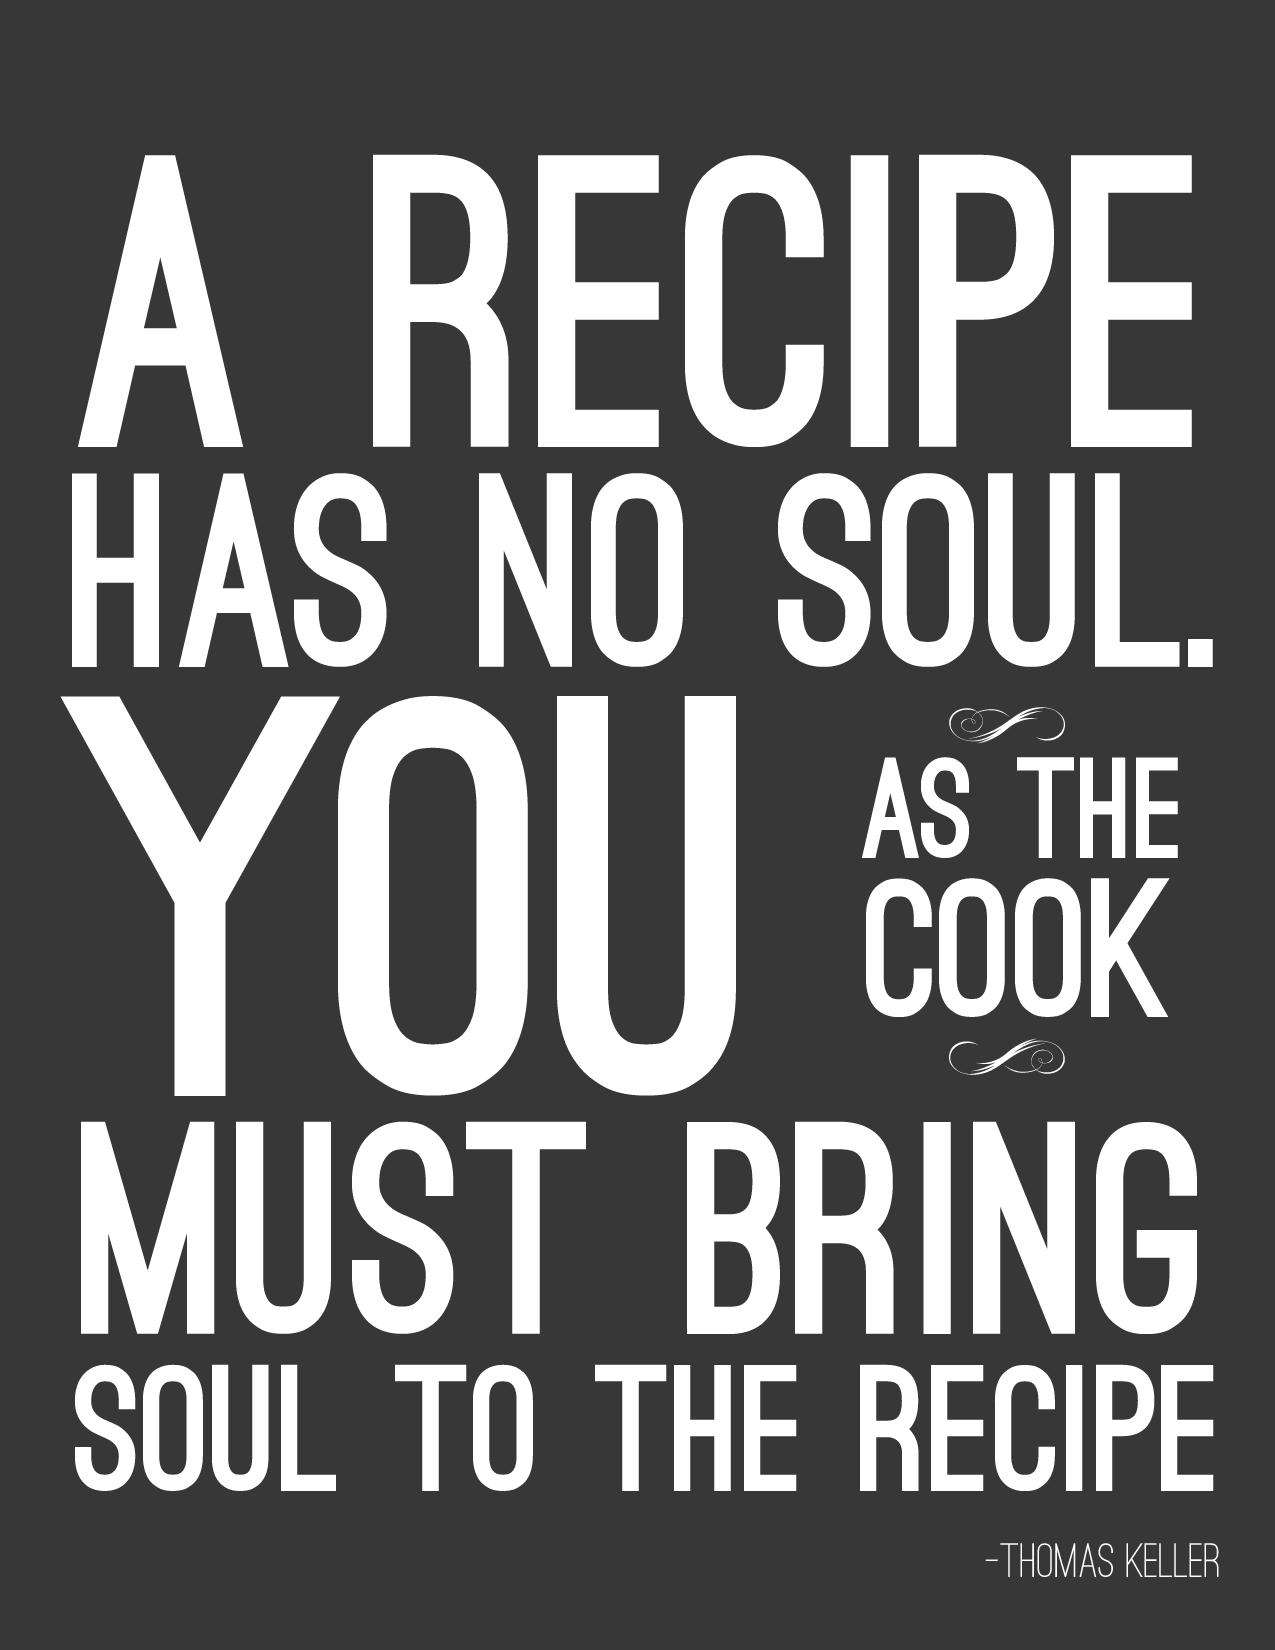 Thomas Keller's quote #3